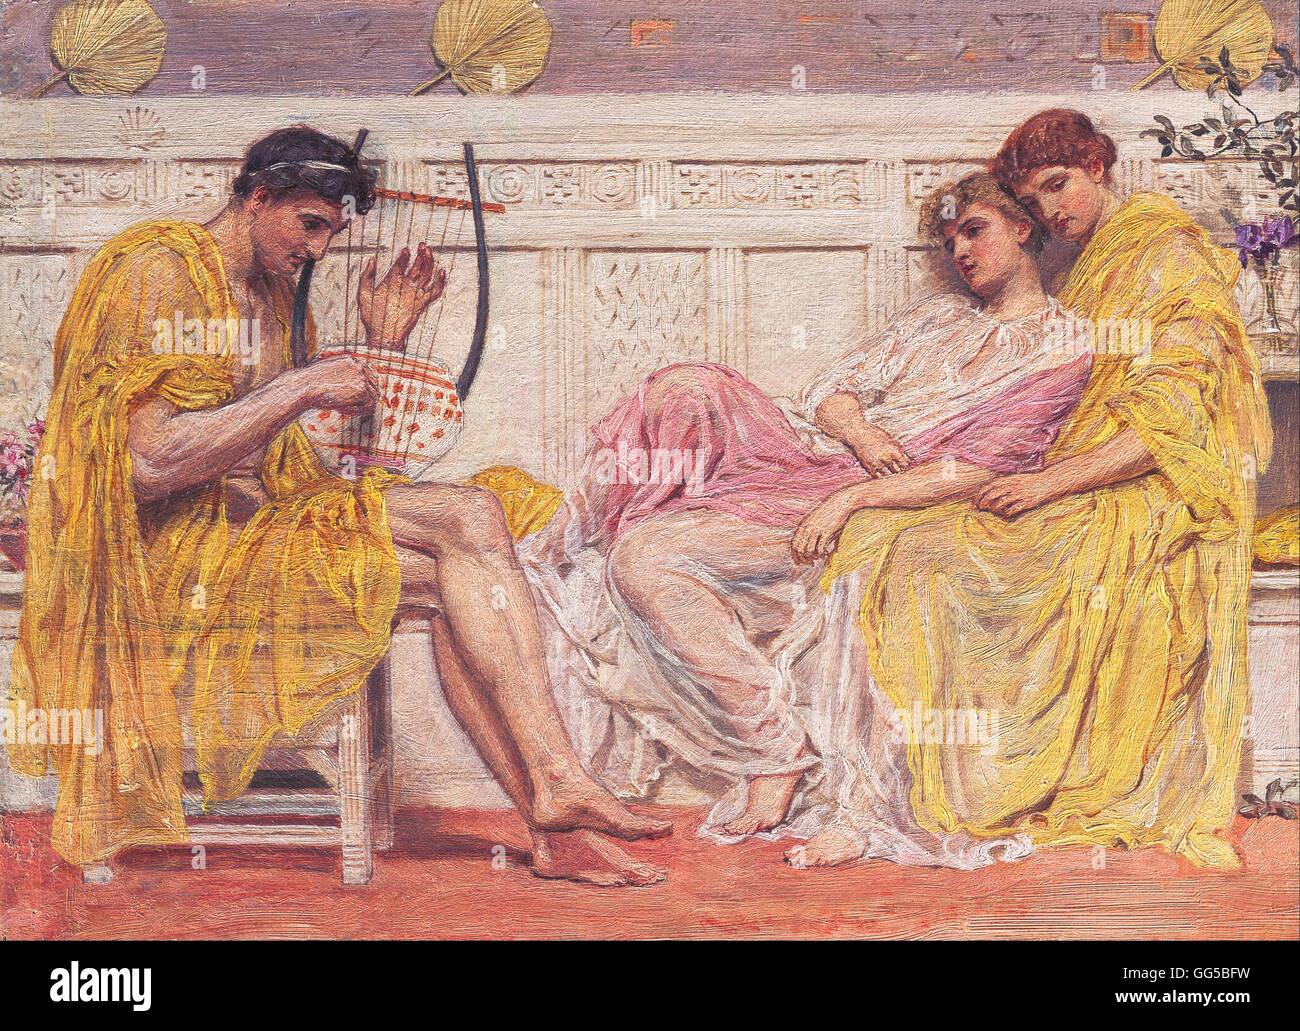 Albert Joseph Moore - A Musician - Stock Image